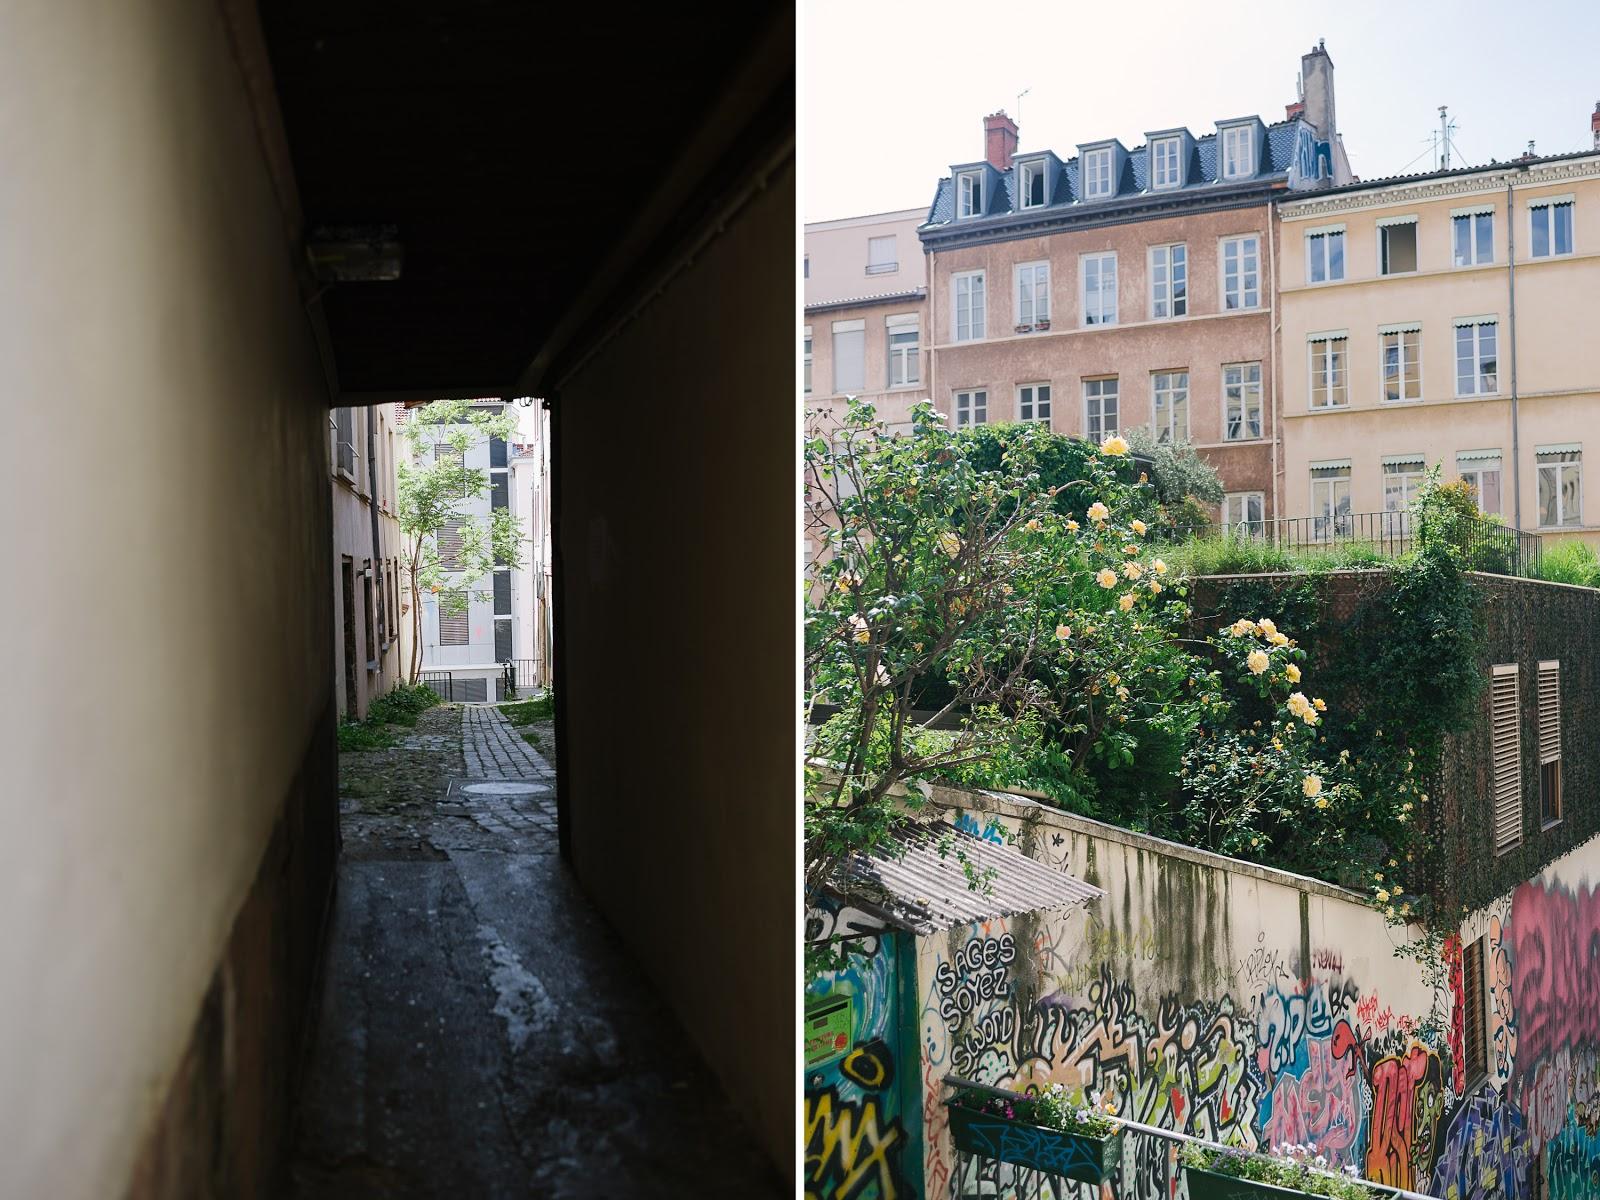 Beautyosuaurs Lex-Alex Good-Lifestyle Blog-Travel-Lyon-France-AlexGoodTravels-Traboules-Farmers Market-Cathedral Saint-Jean Lyon